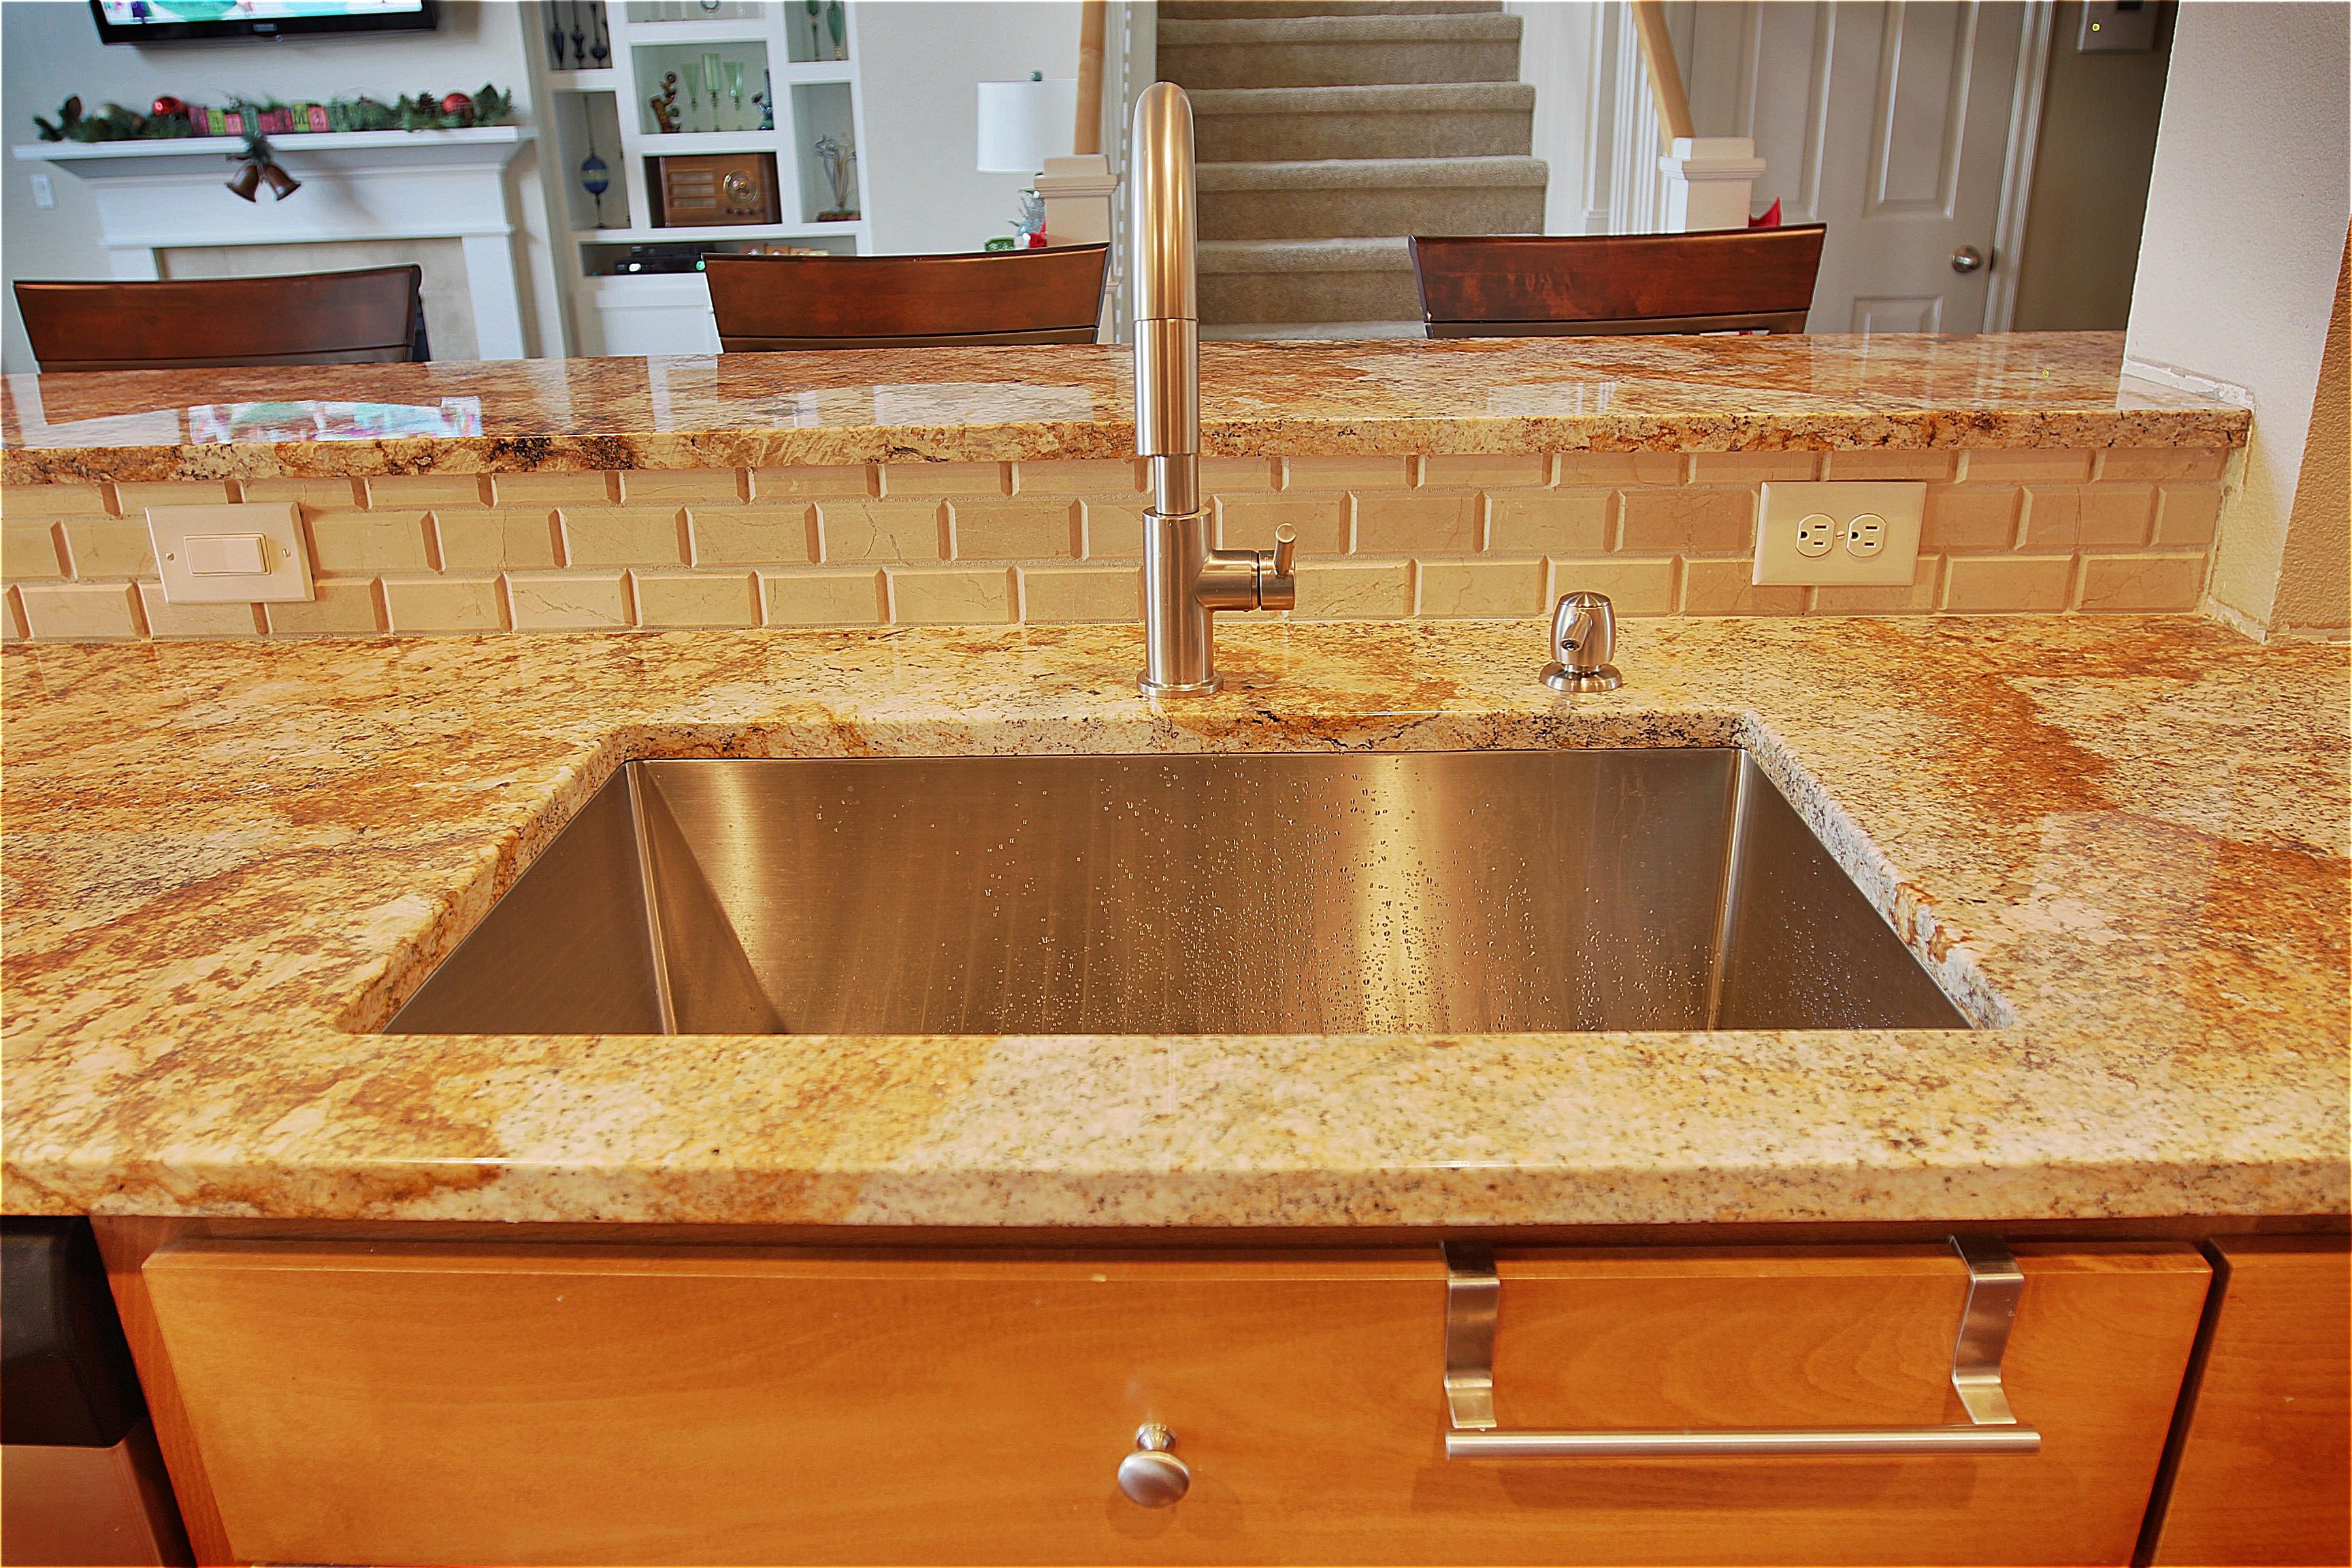 undermount sink failure in granite and